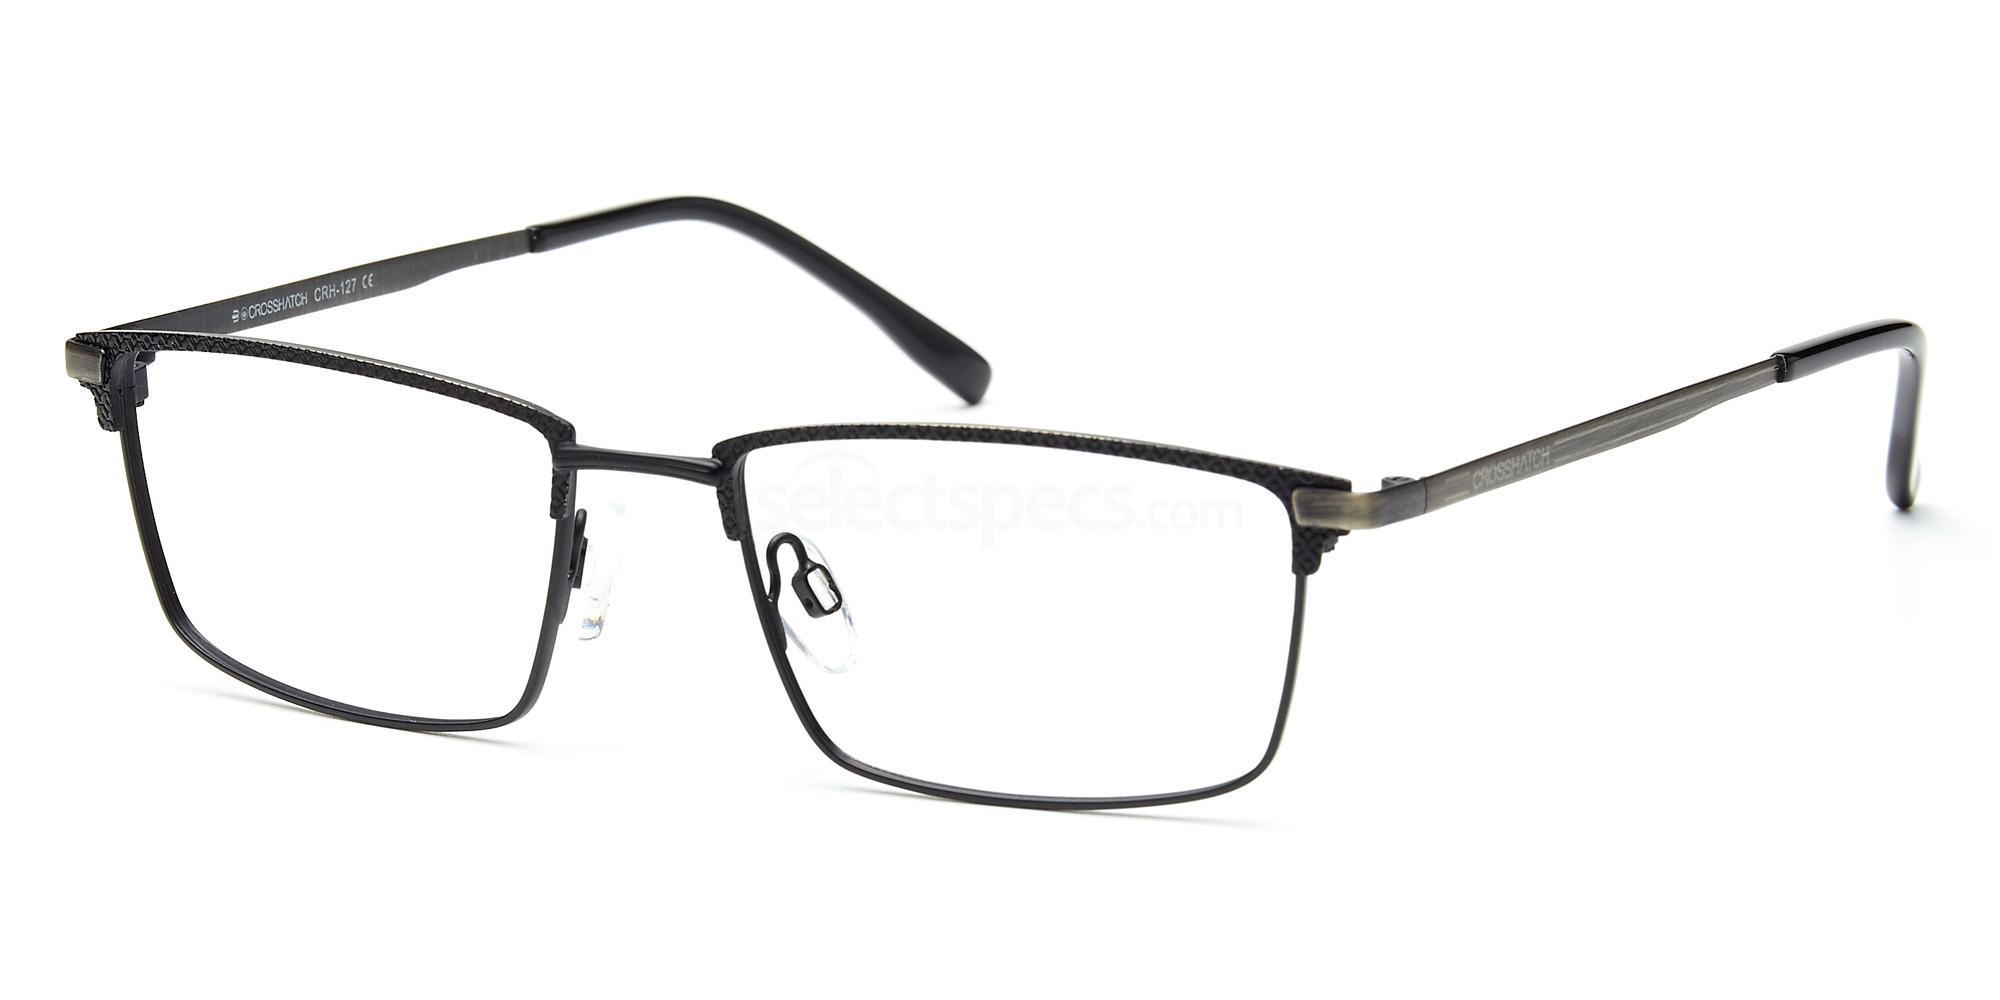 C1 CRH127 Glasses, Crosshatch